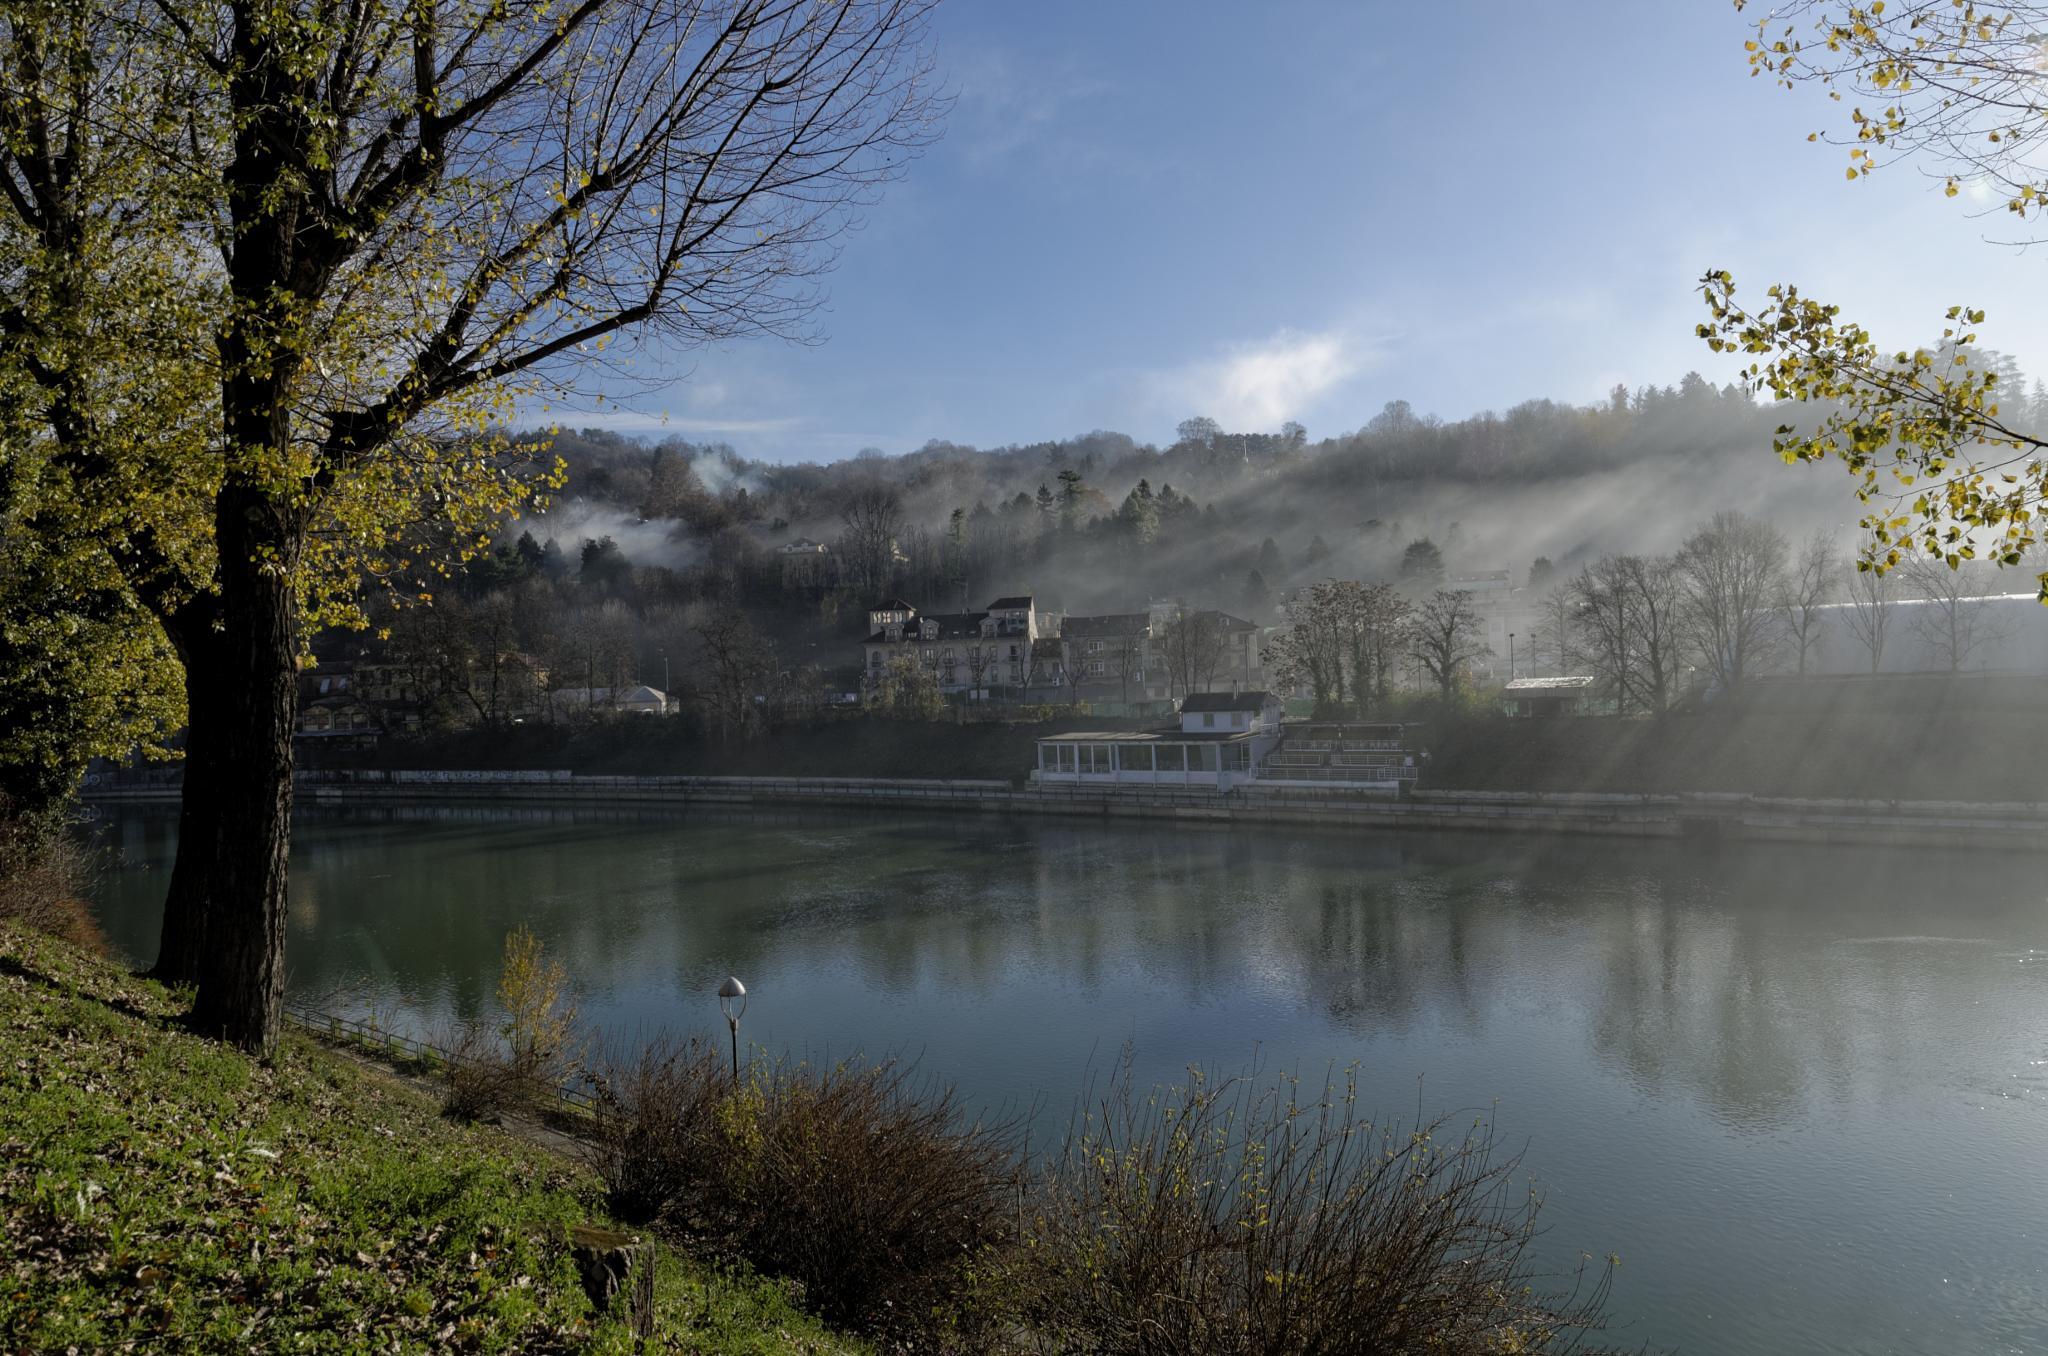 River Po by roncarolo.piero